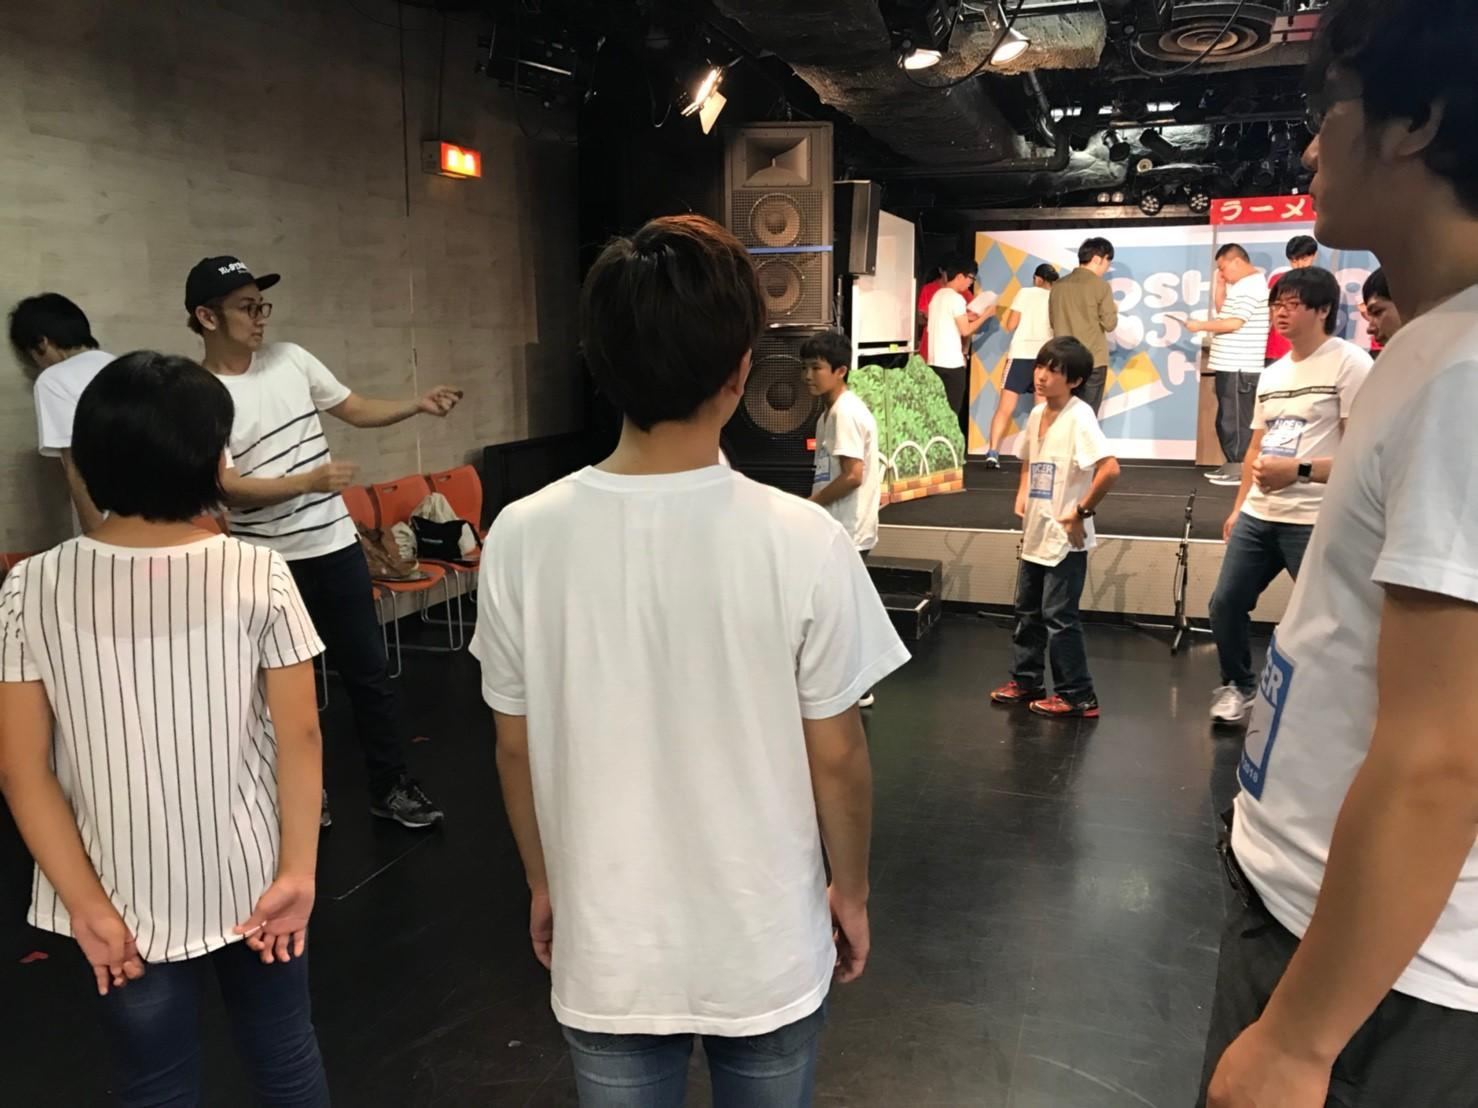 http://news.yoshimoto.co.jp/20181006174734-769696e0bcdbc9075e7a5e0960011f219e7119c3.jpg